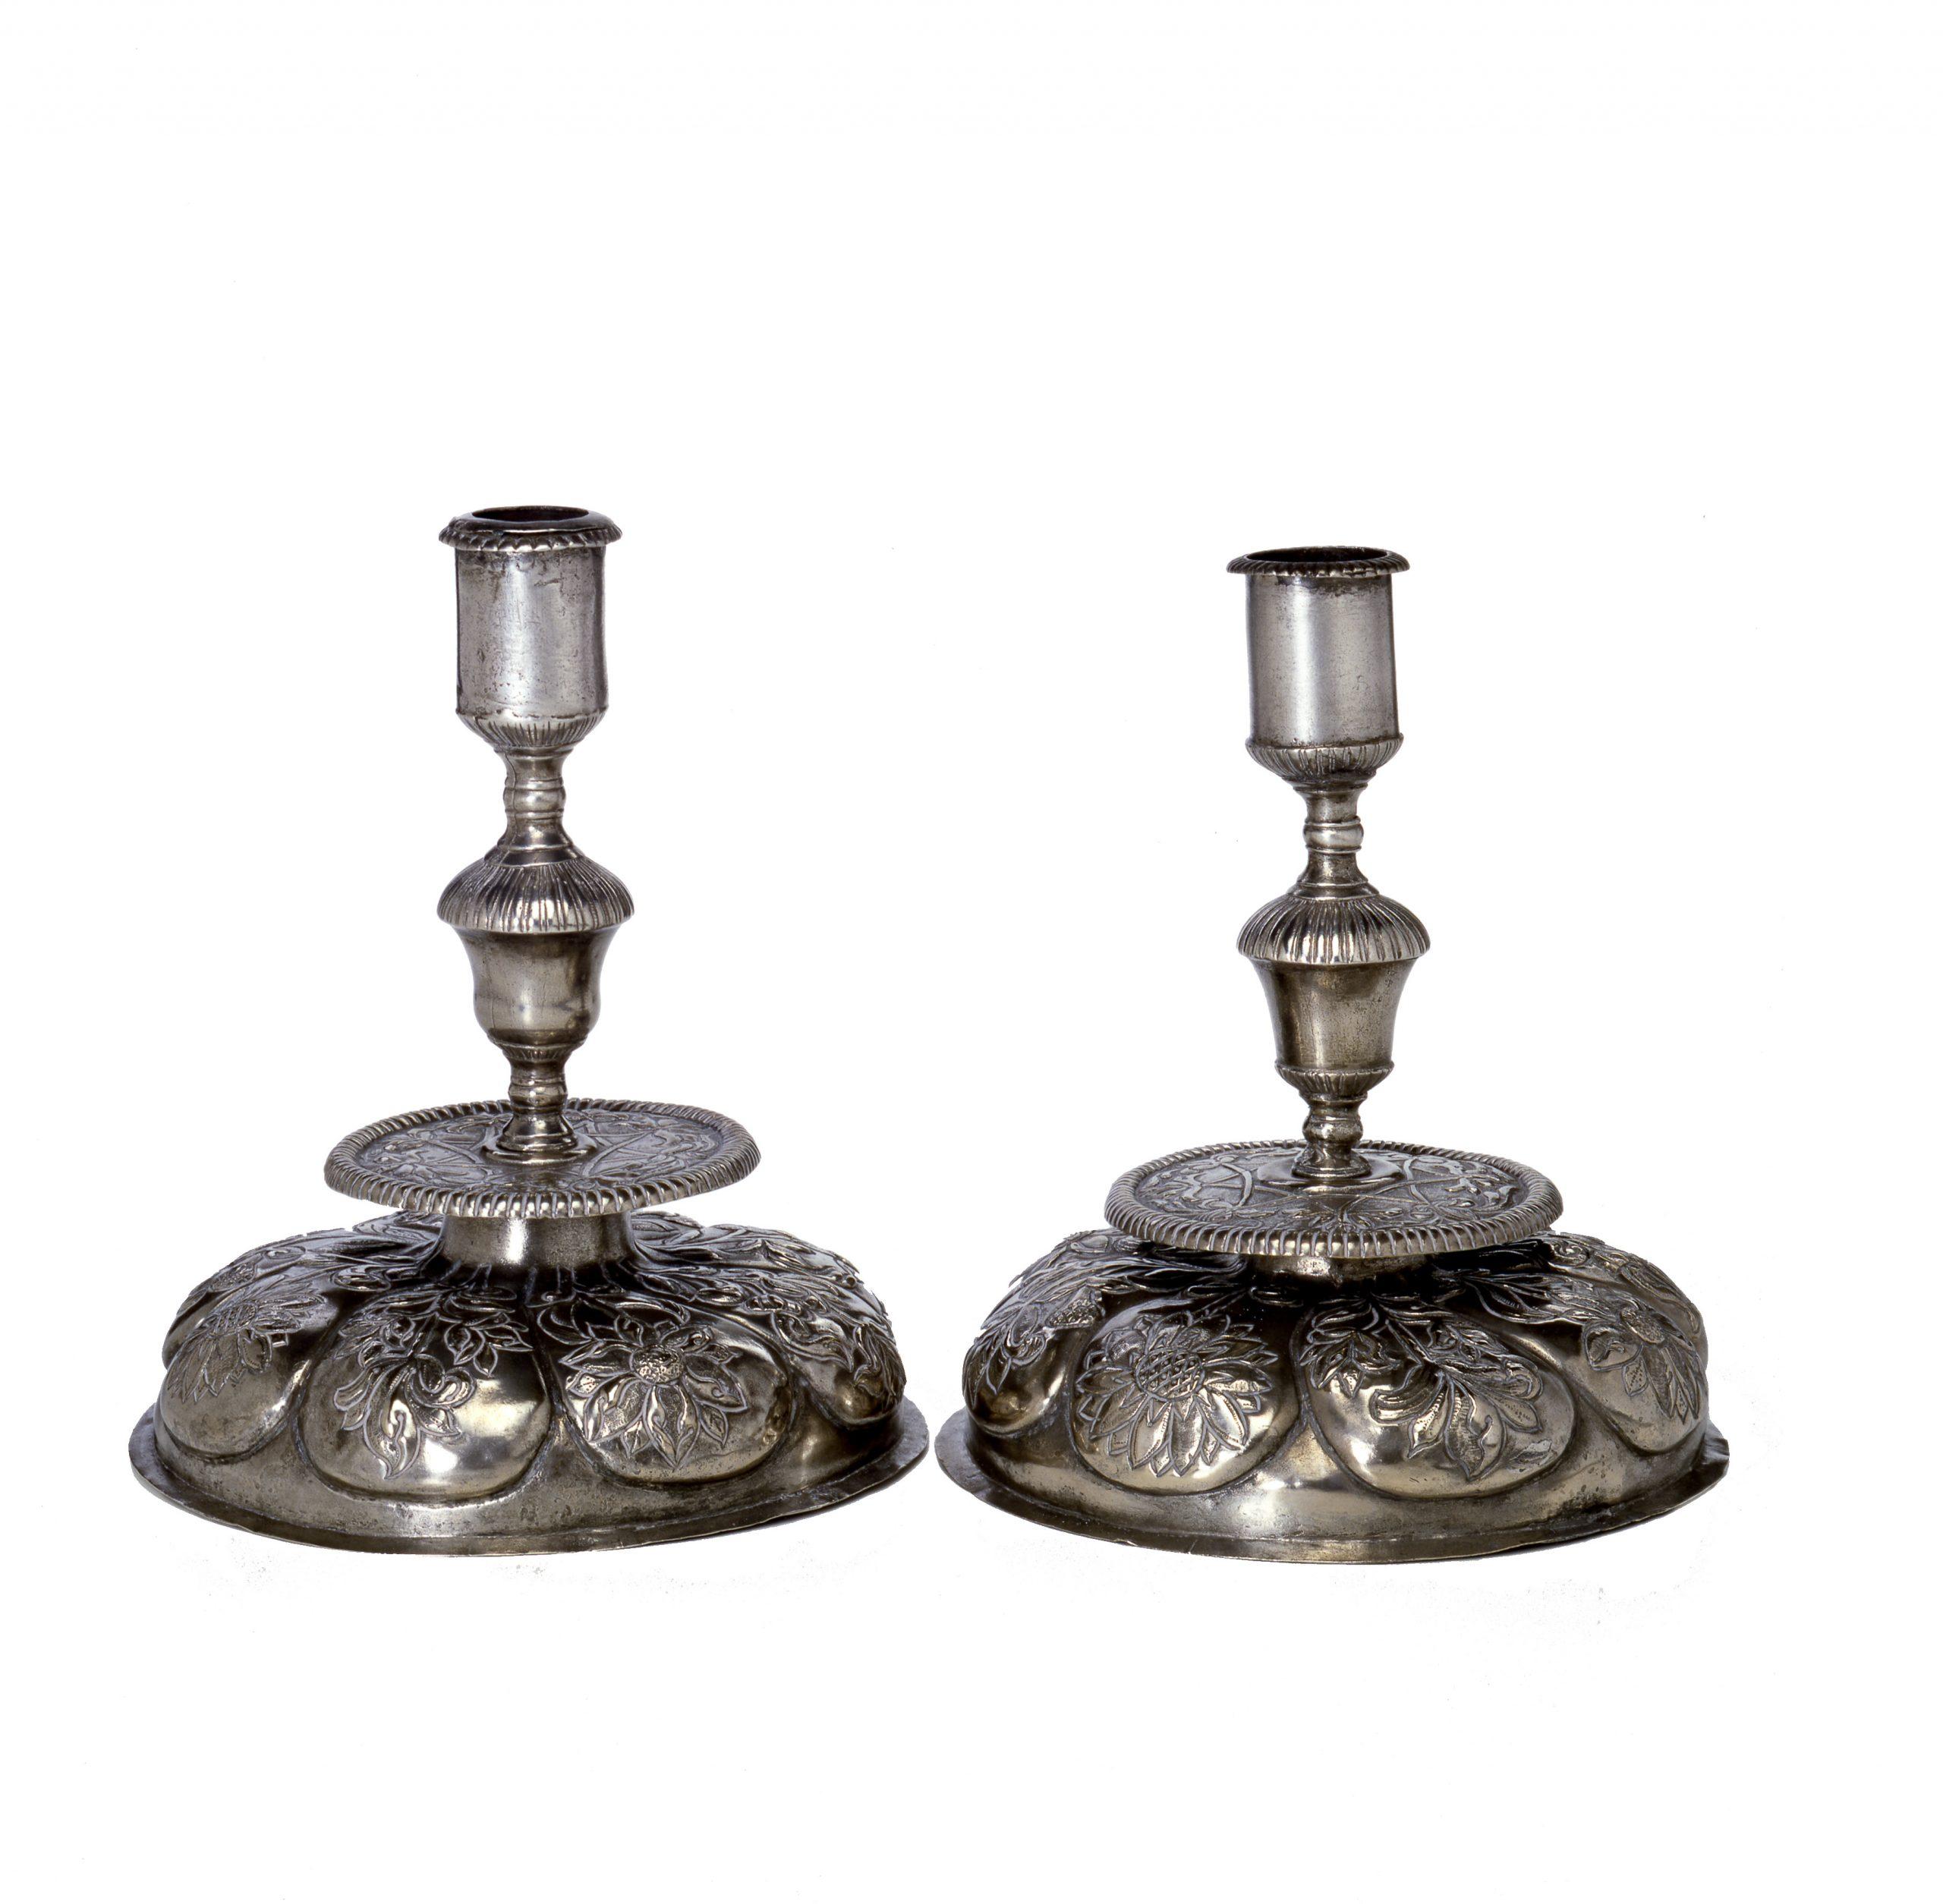 Elegant Hammered Sabbath Candlesticks – Silver Plated